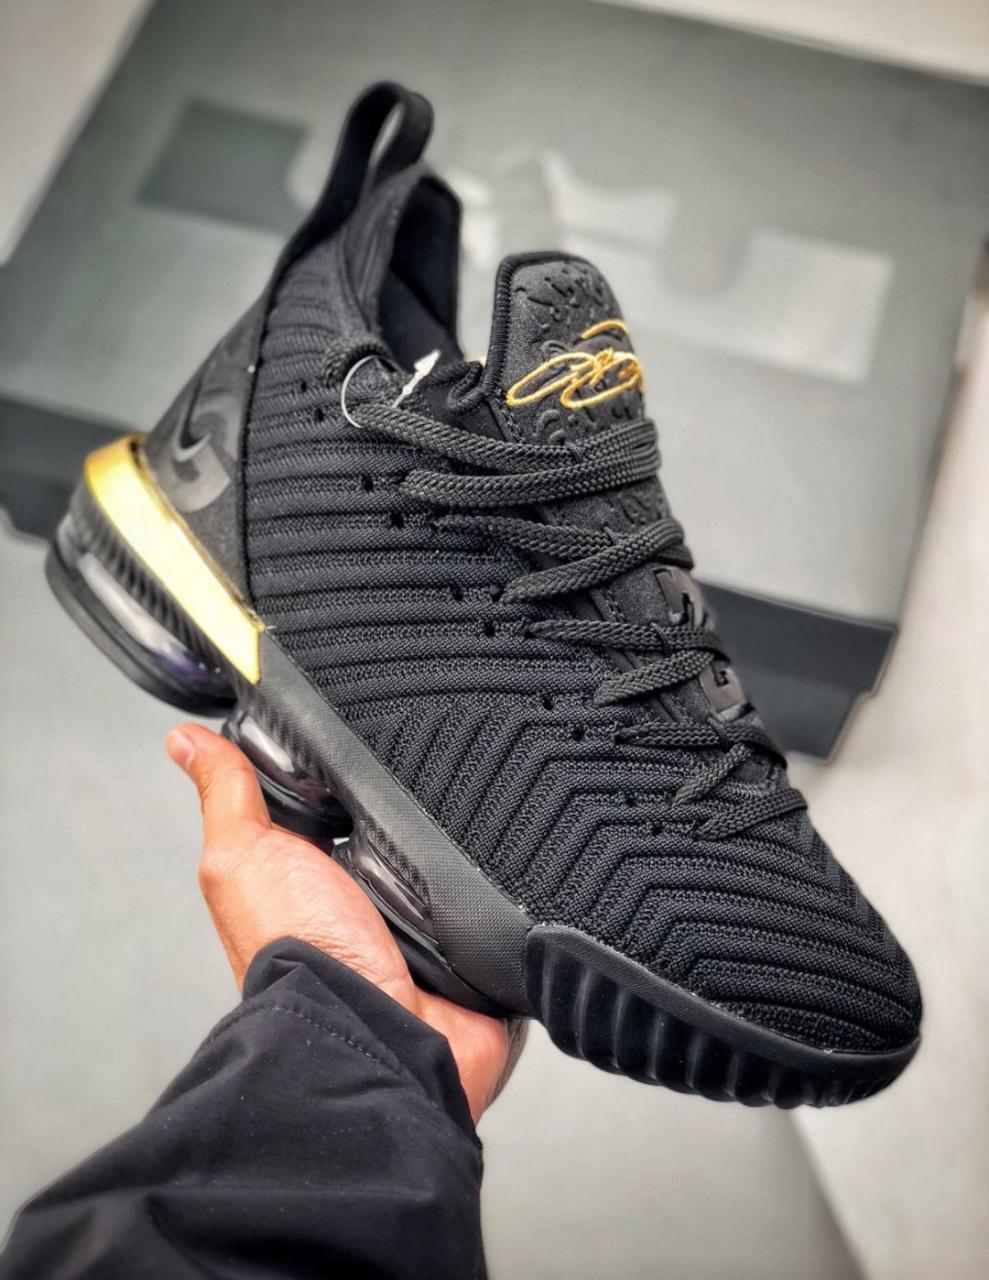 Basketball Shoes - Buy Nike LEBRON 16